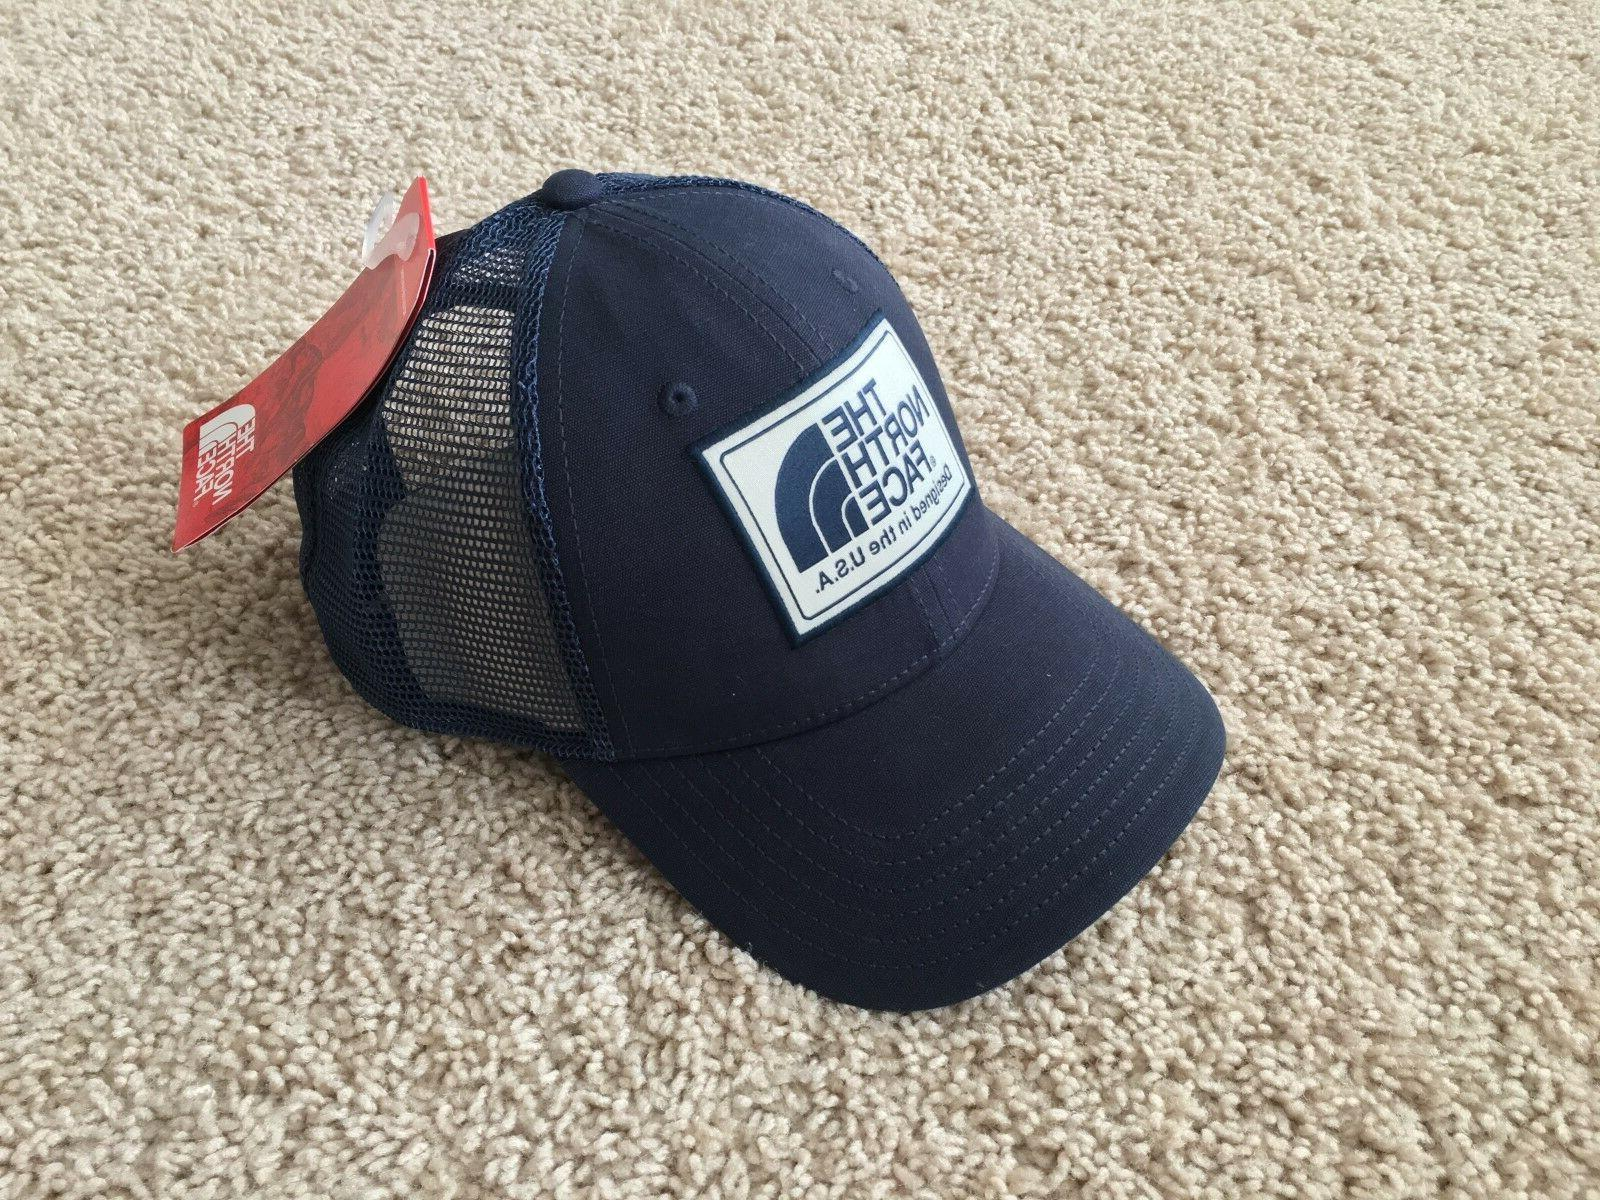 new mudder trucker mesh snapback cap hat